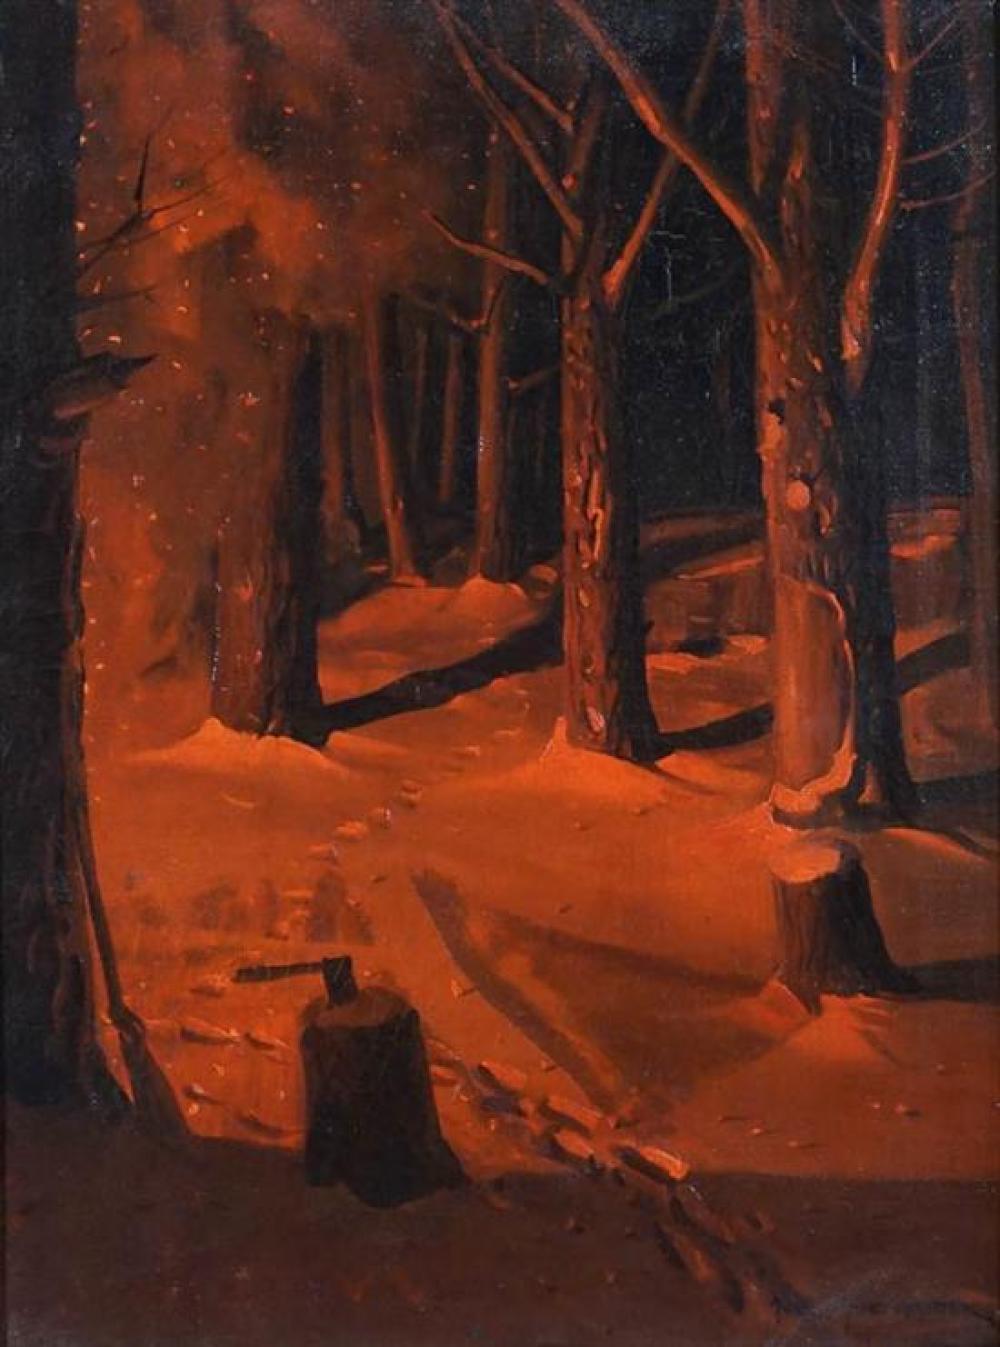 Svend Svendsen (Norwegian 1864-1945), Winter Forest Fire at Night